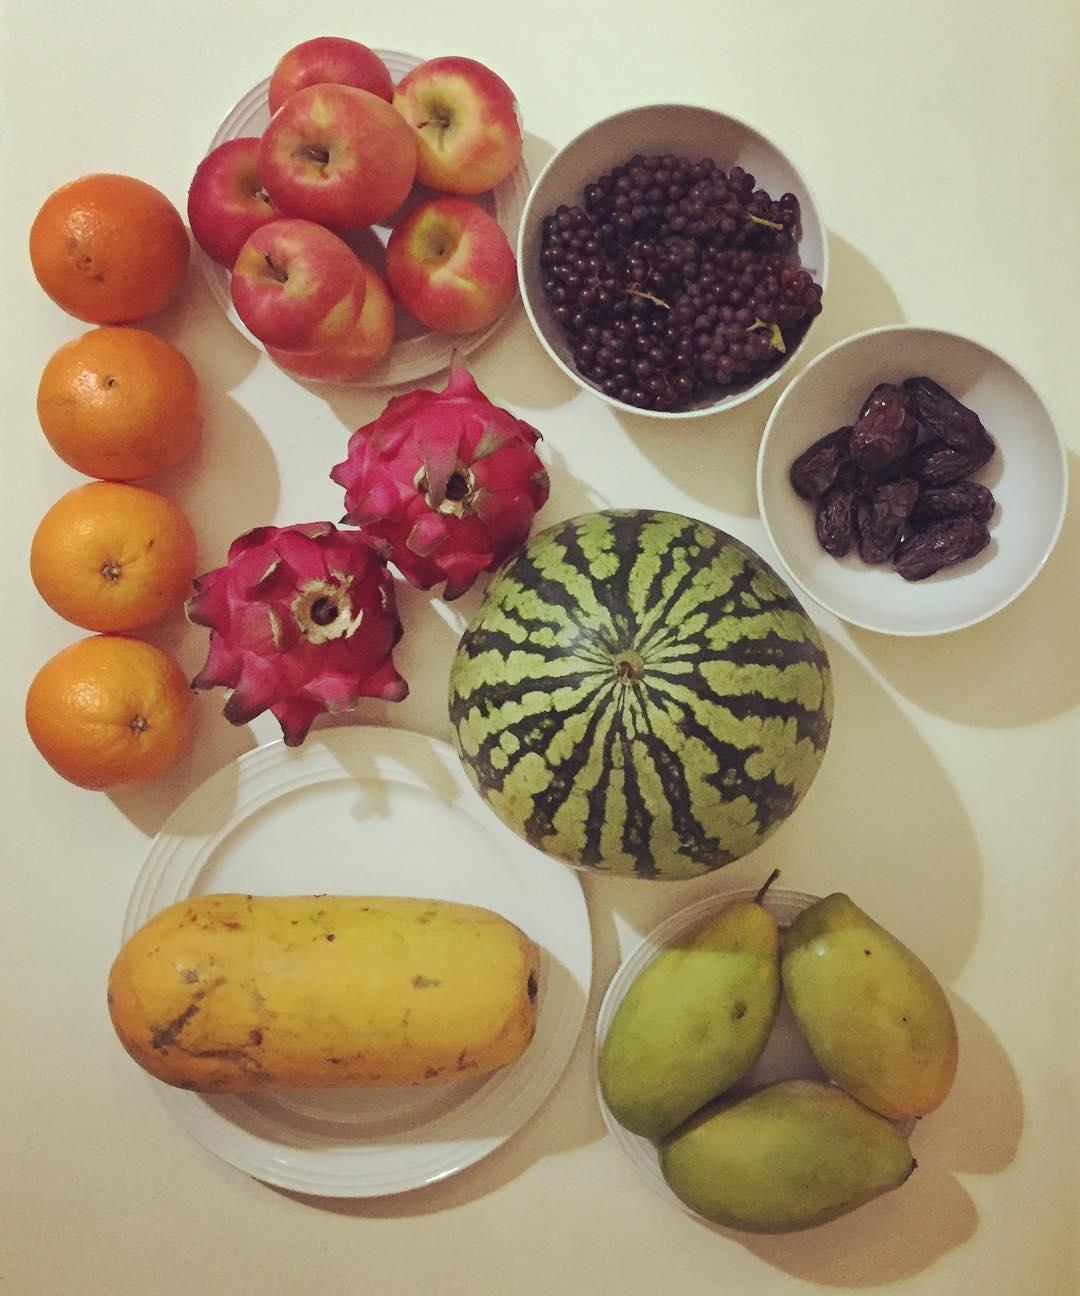 kuala-lumpur-yoga-detox-retreat-foods.png